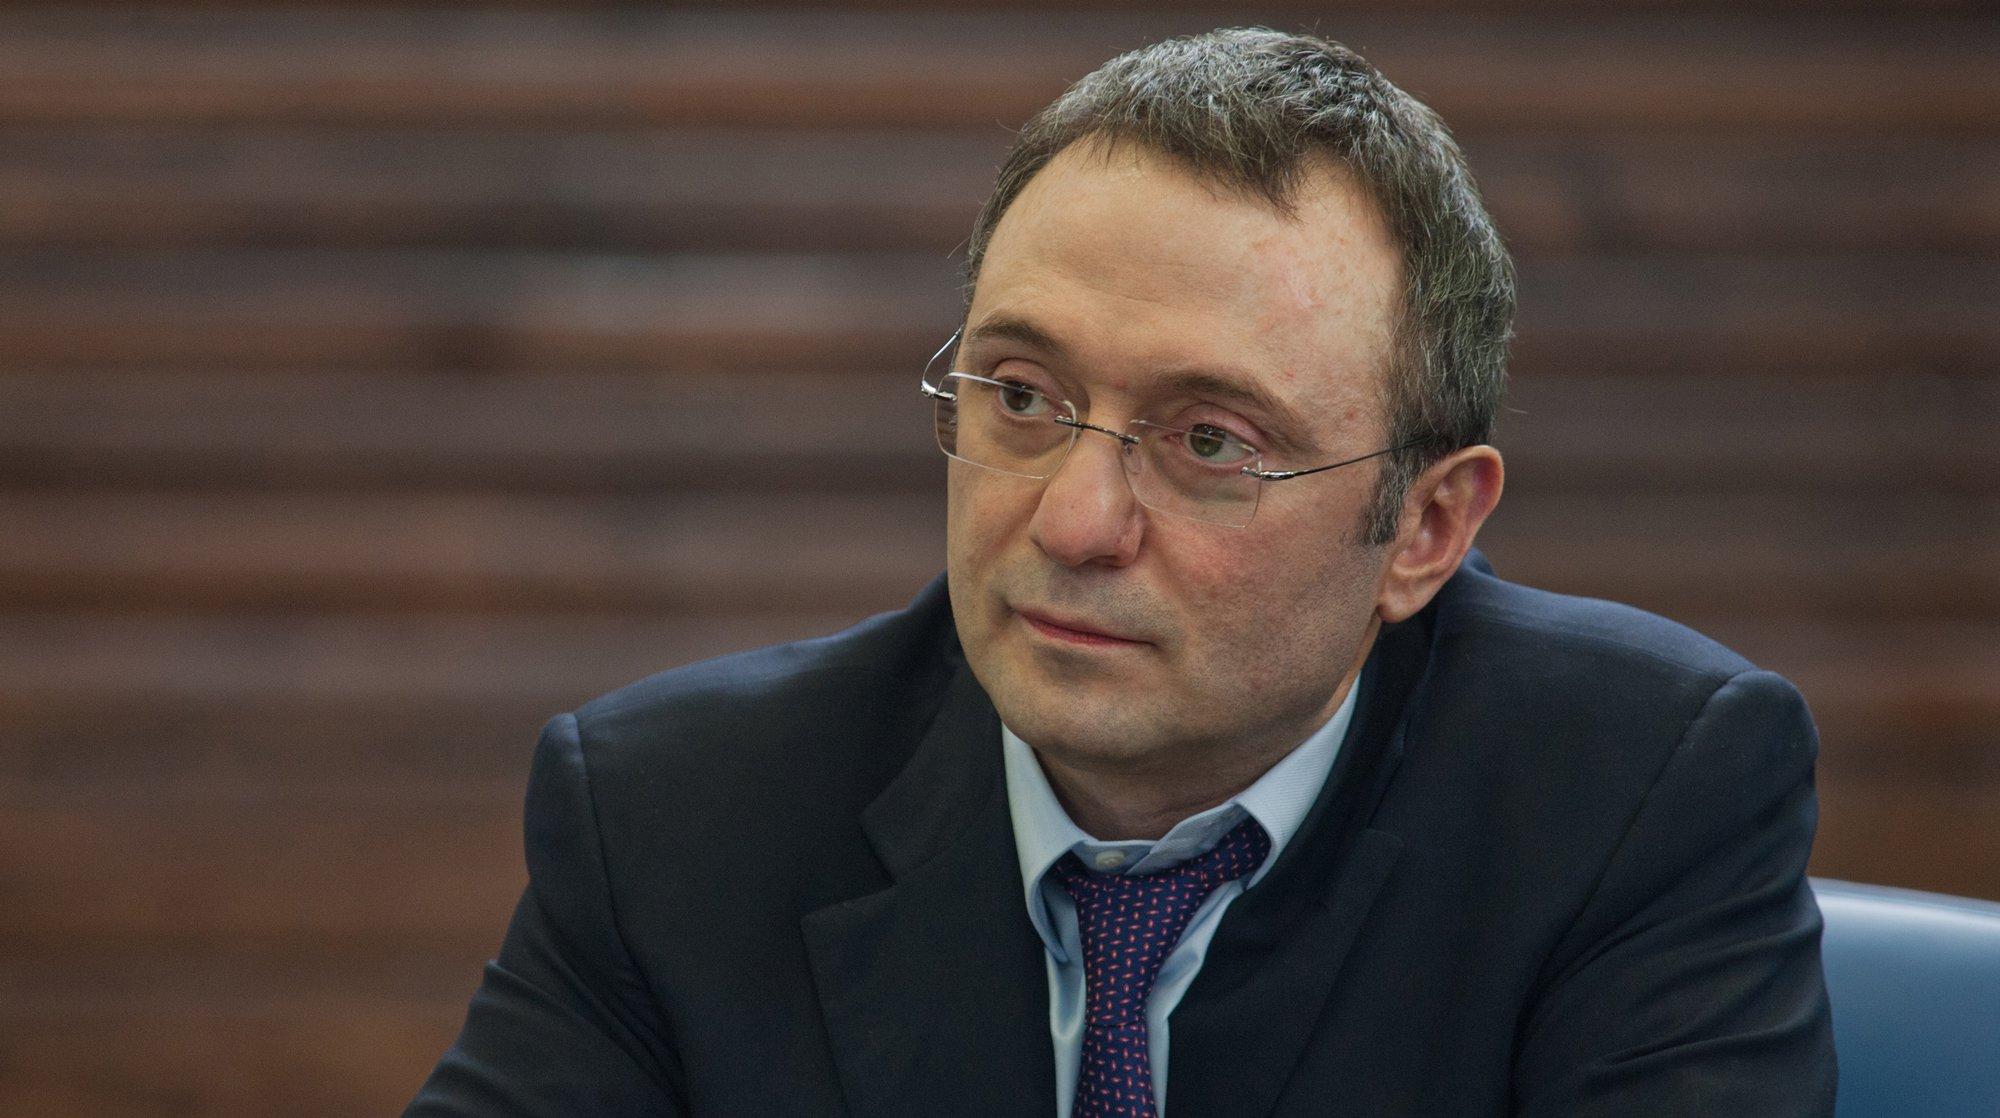 ВНицце схвачен сенатор Керимов